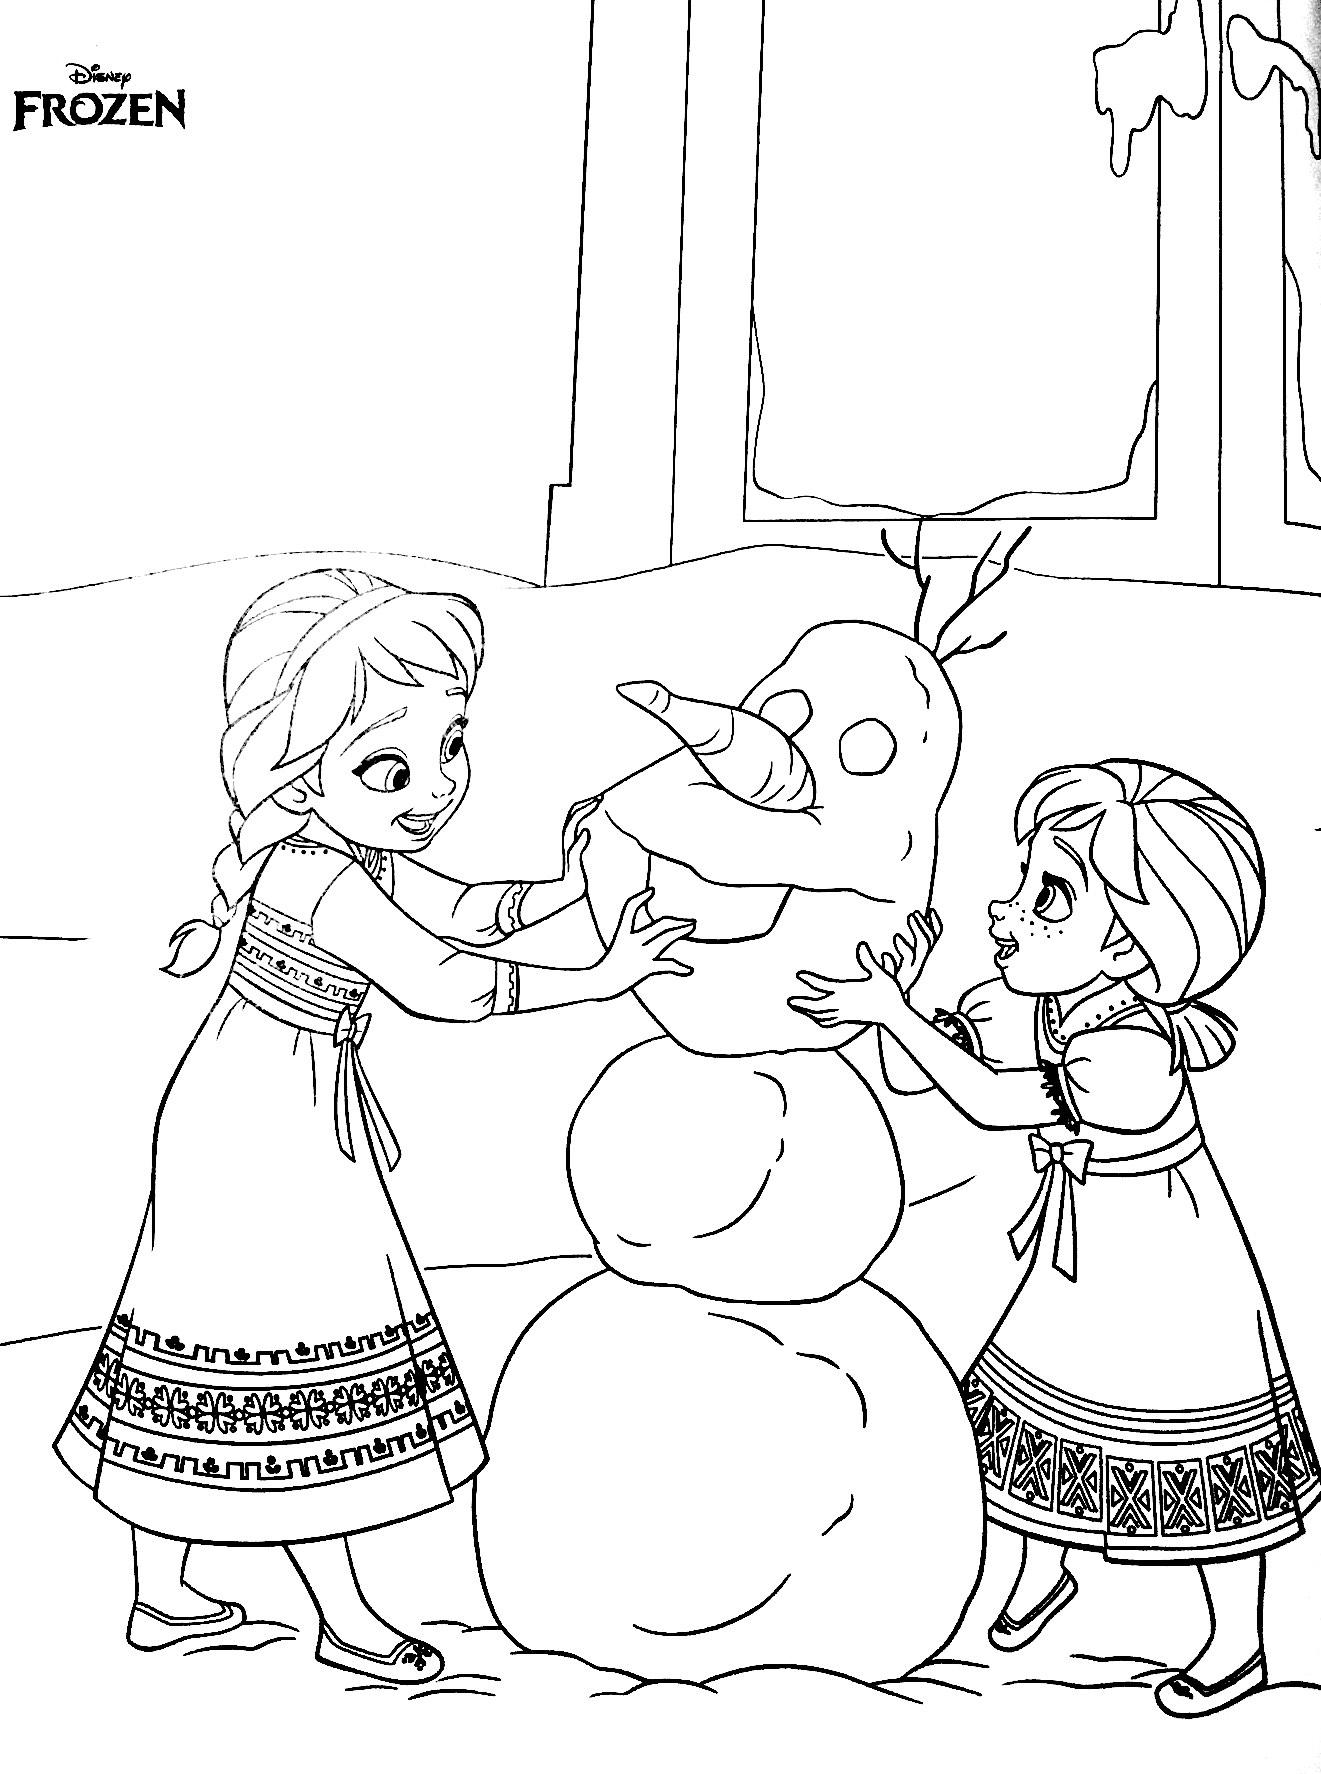 Anna Elsa en Olaf